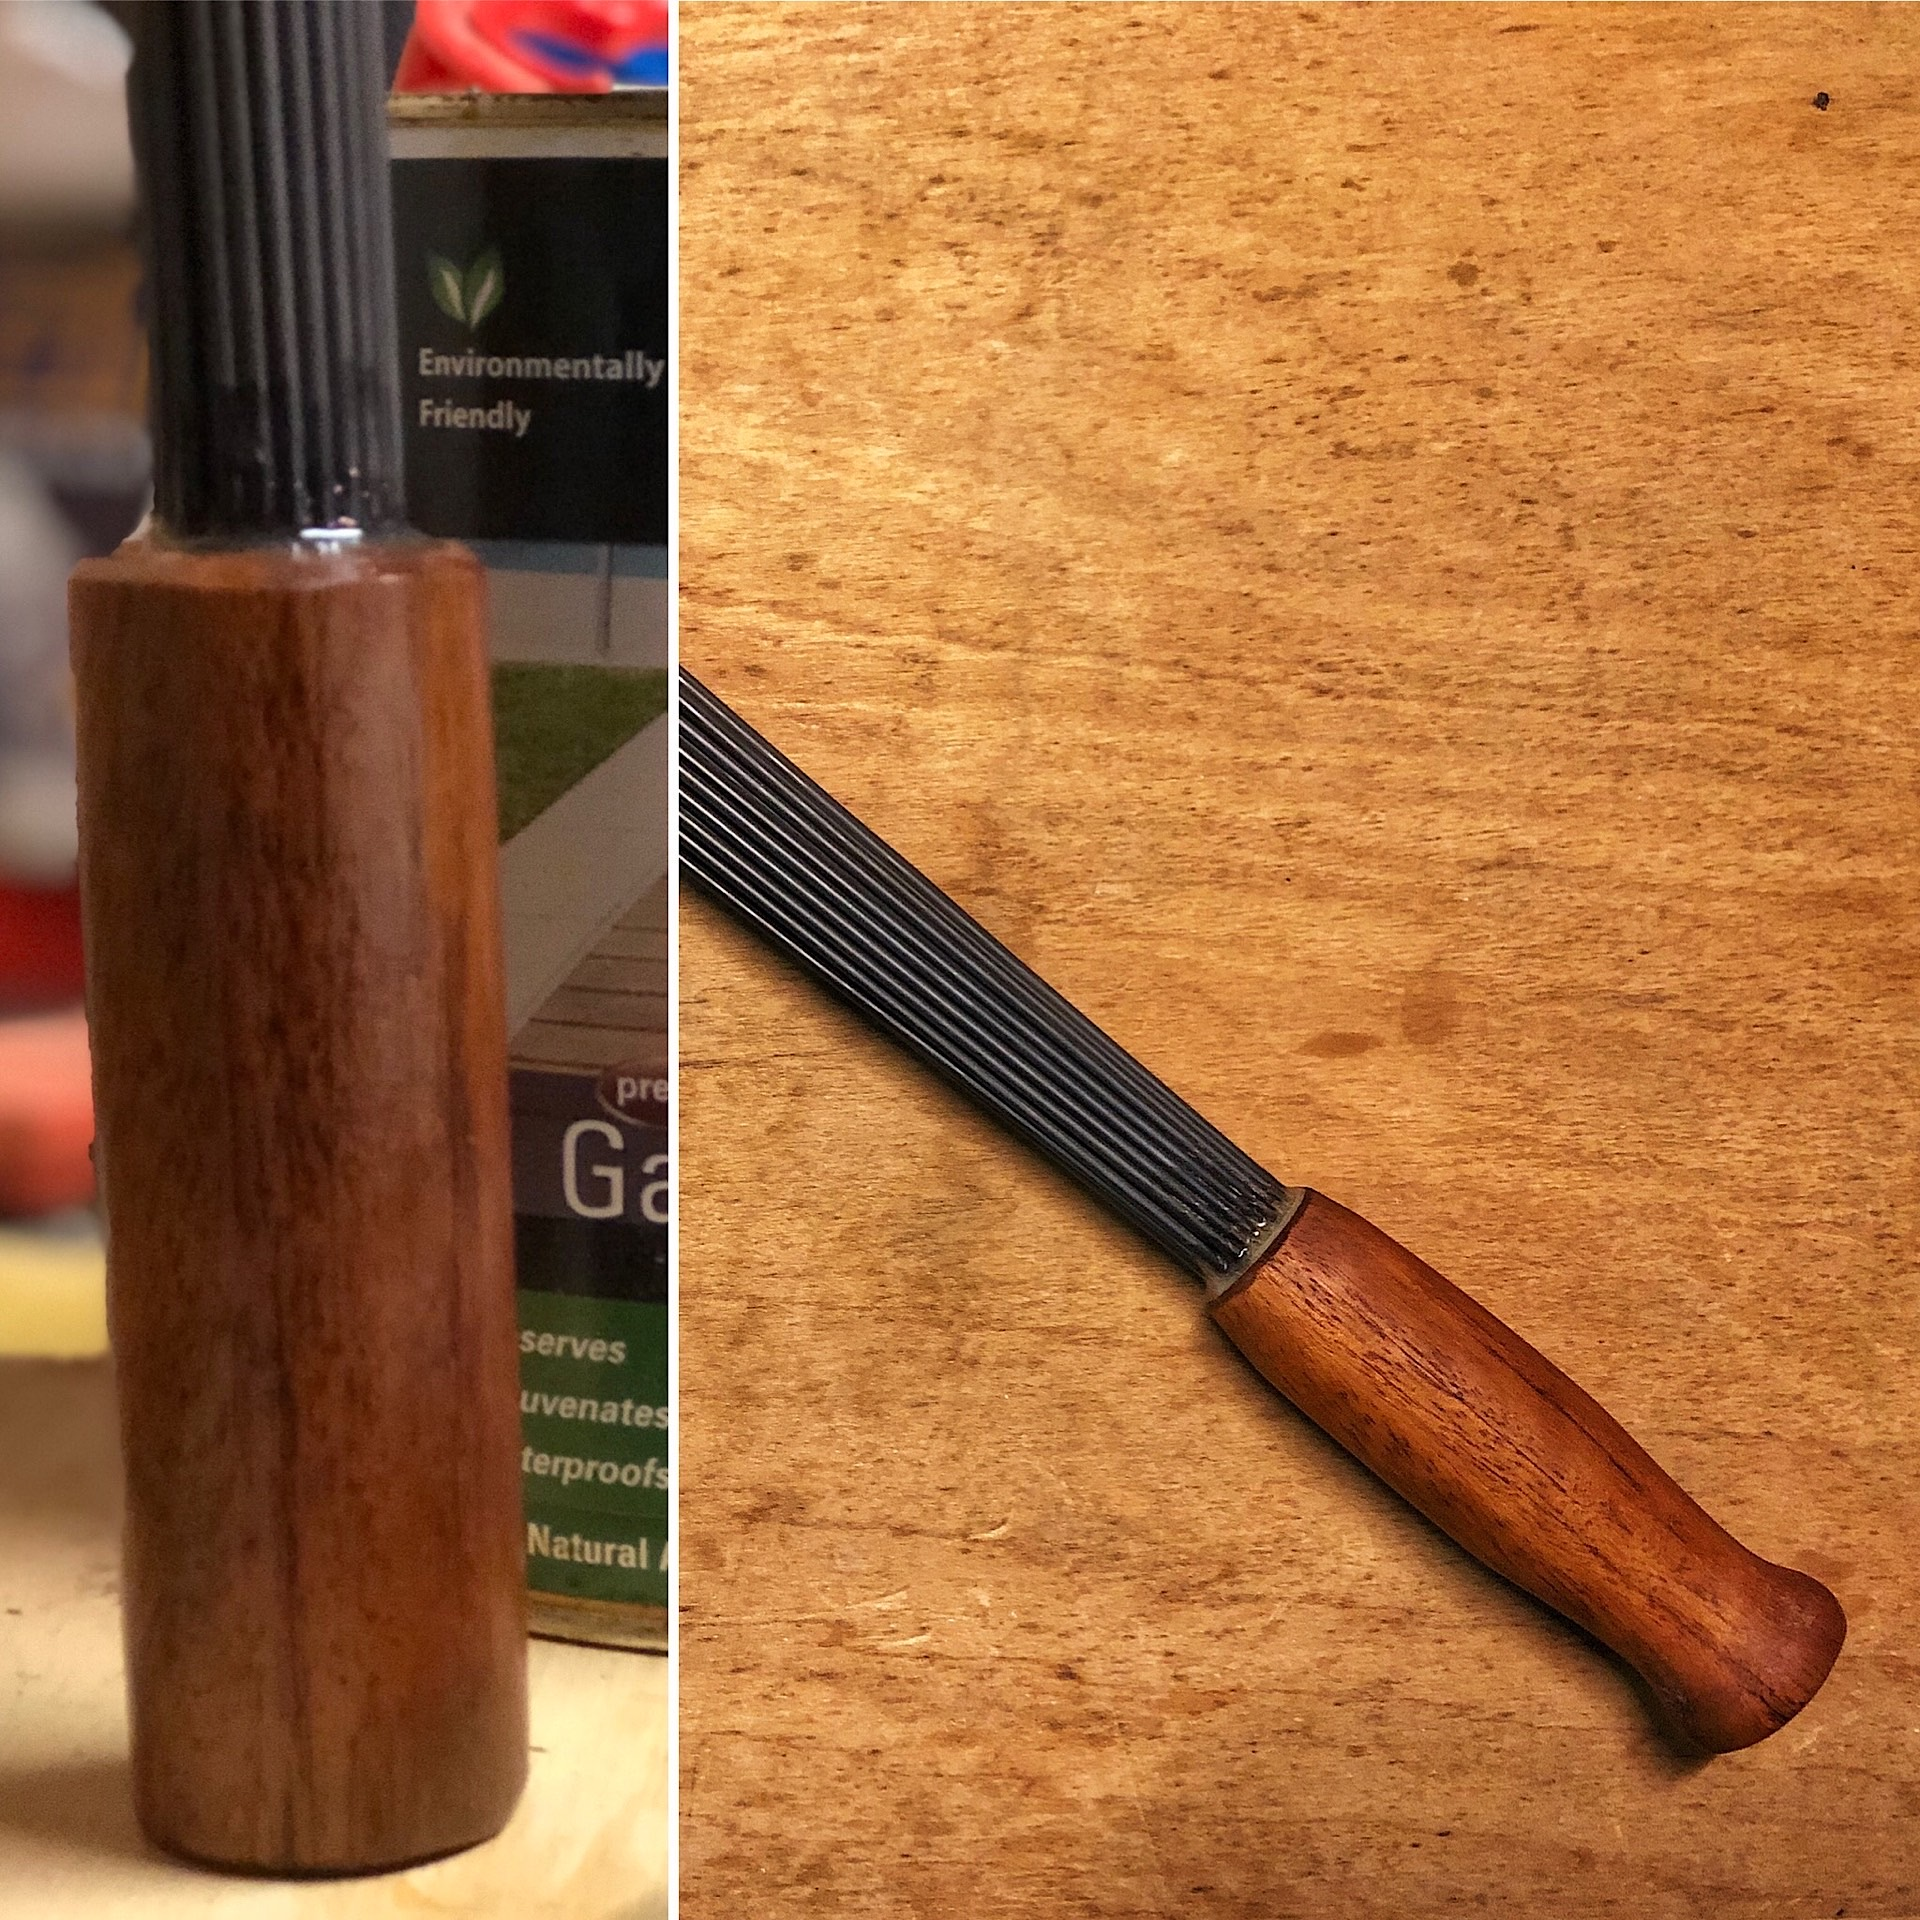 Homemade steel brush for Iron Shirt body conditioning